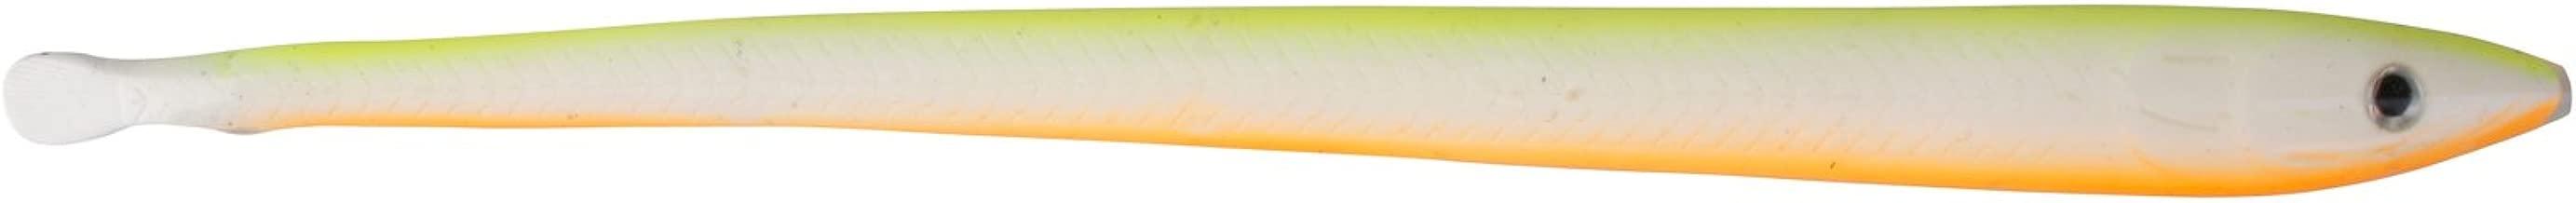 LEURRES SG LB Sandeel Slug 16.5cm 32 - Lemon Back 5pcs